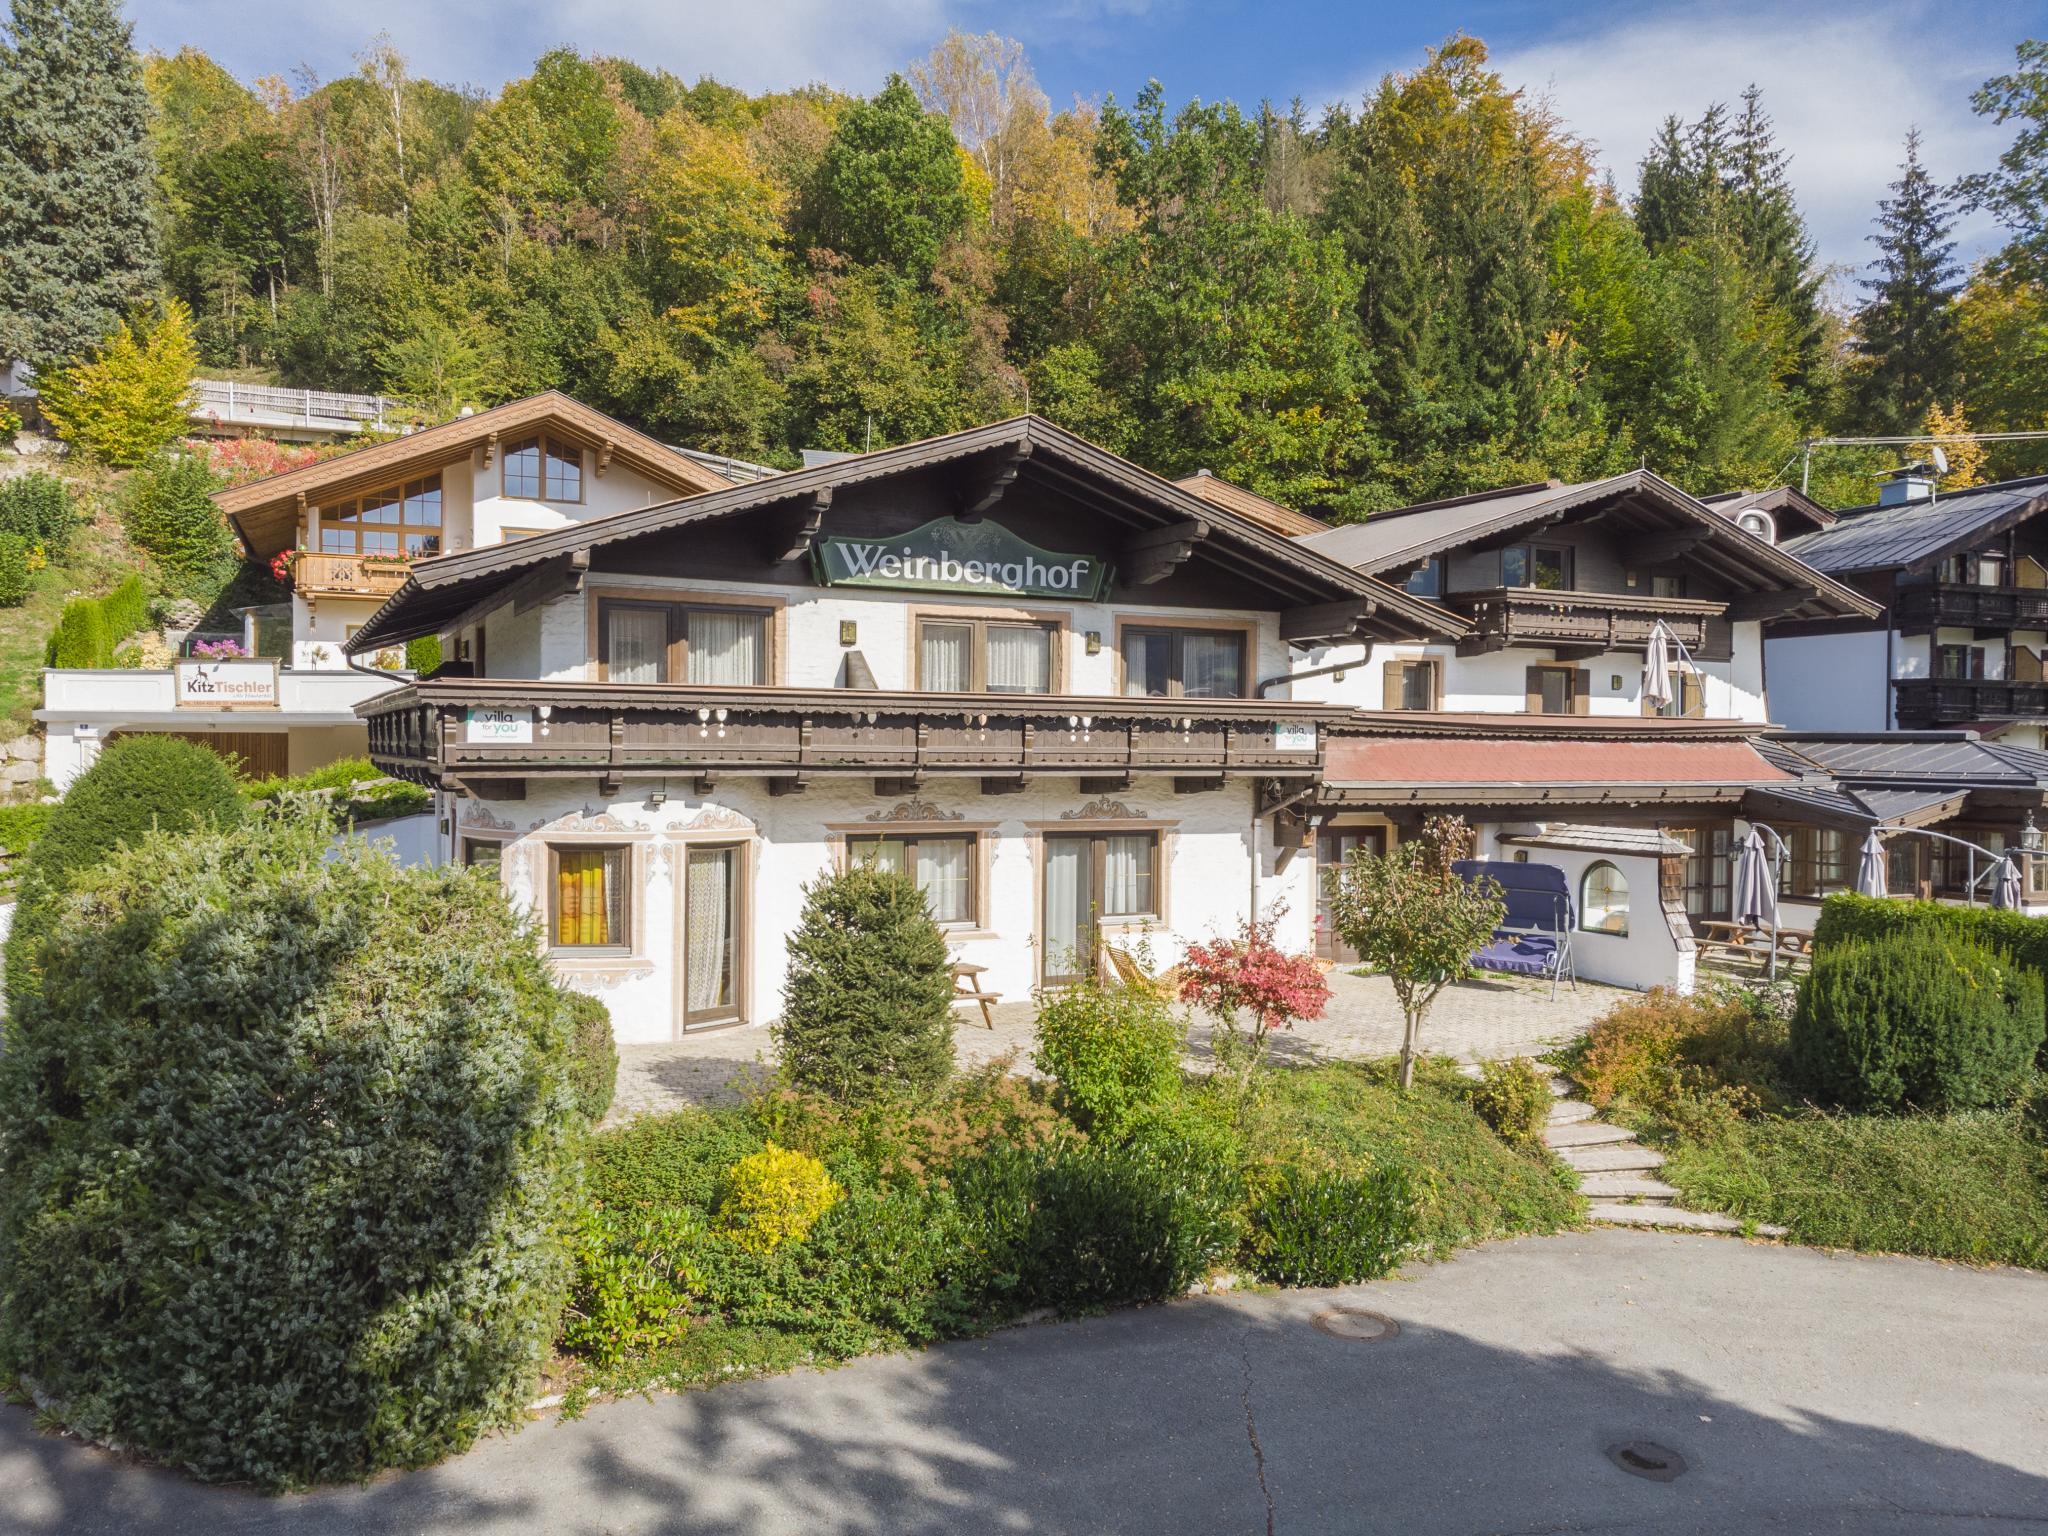 Weinberghof Tirol